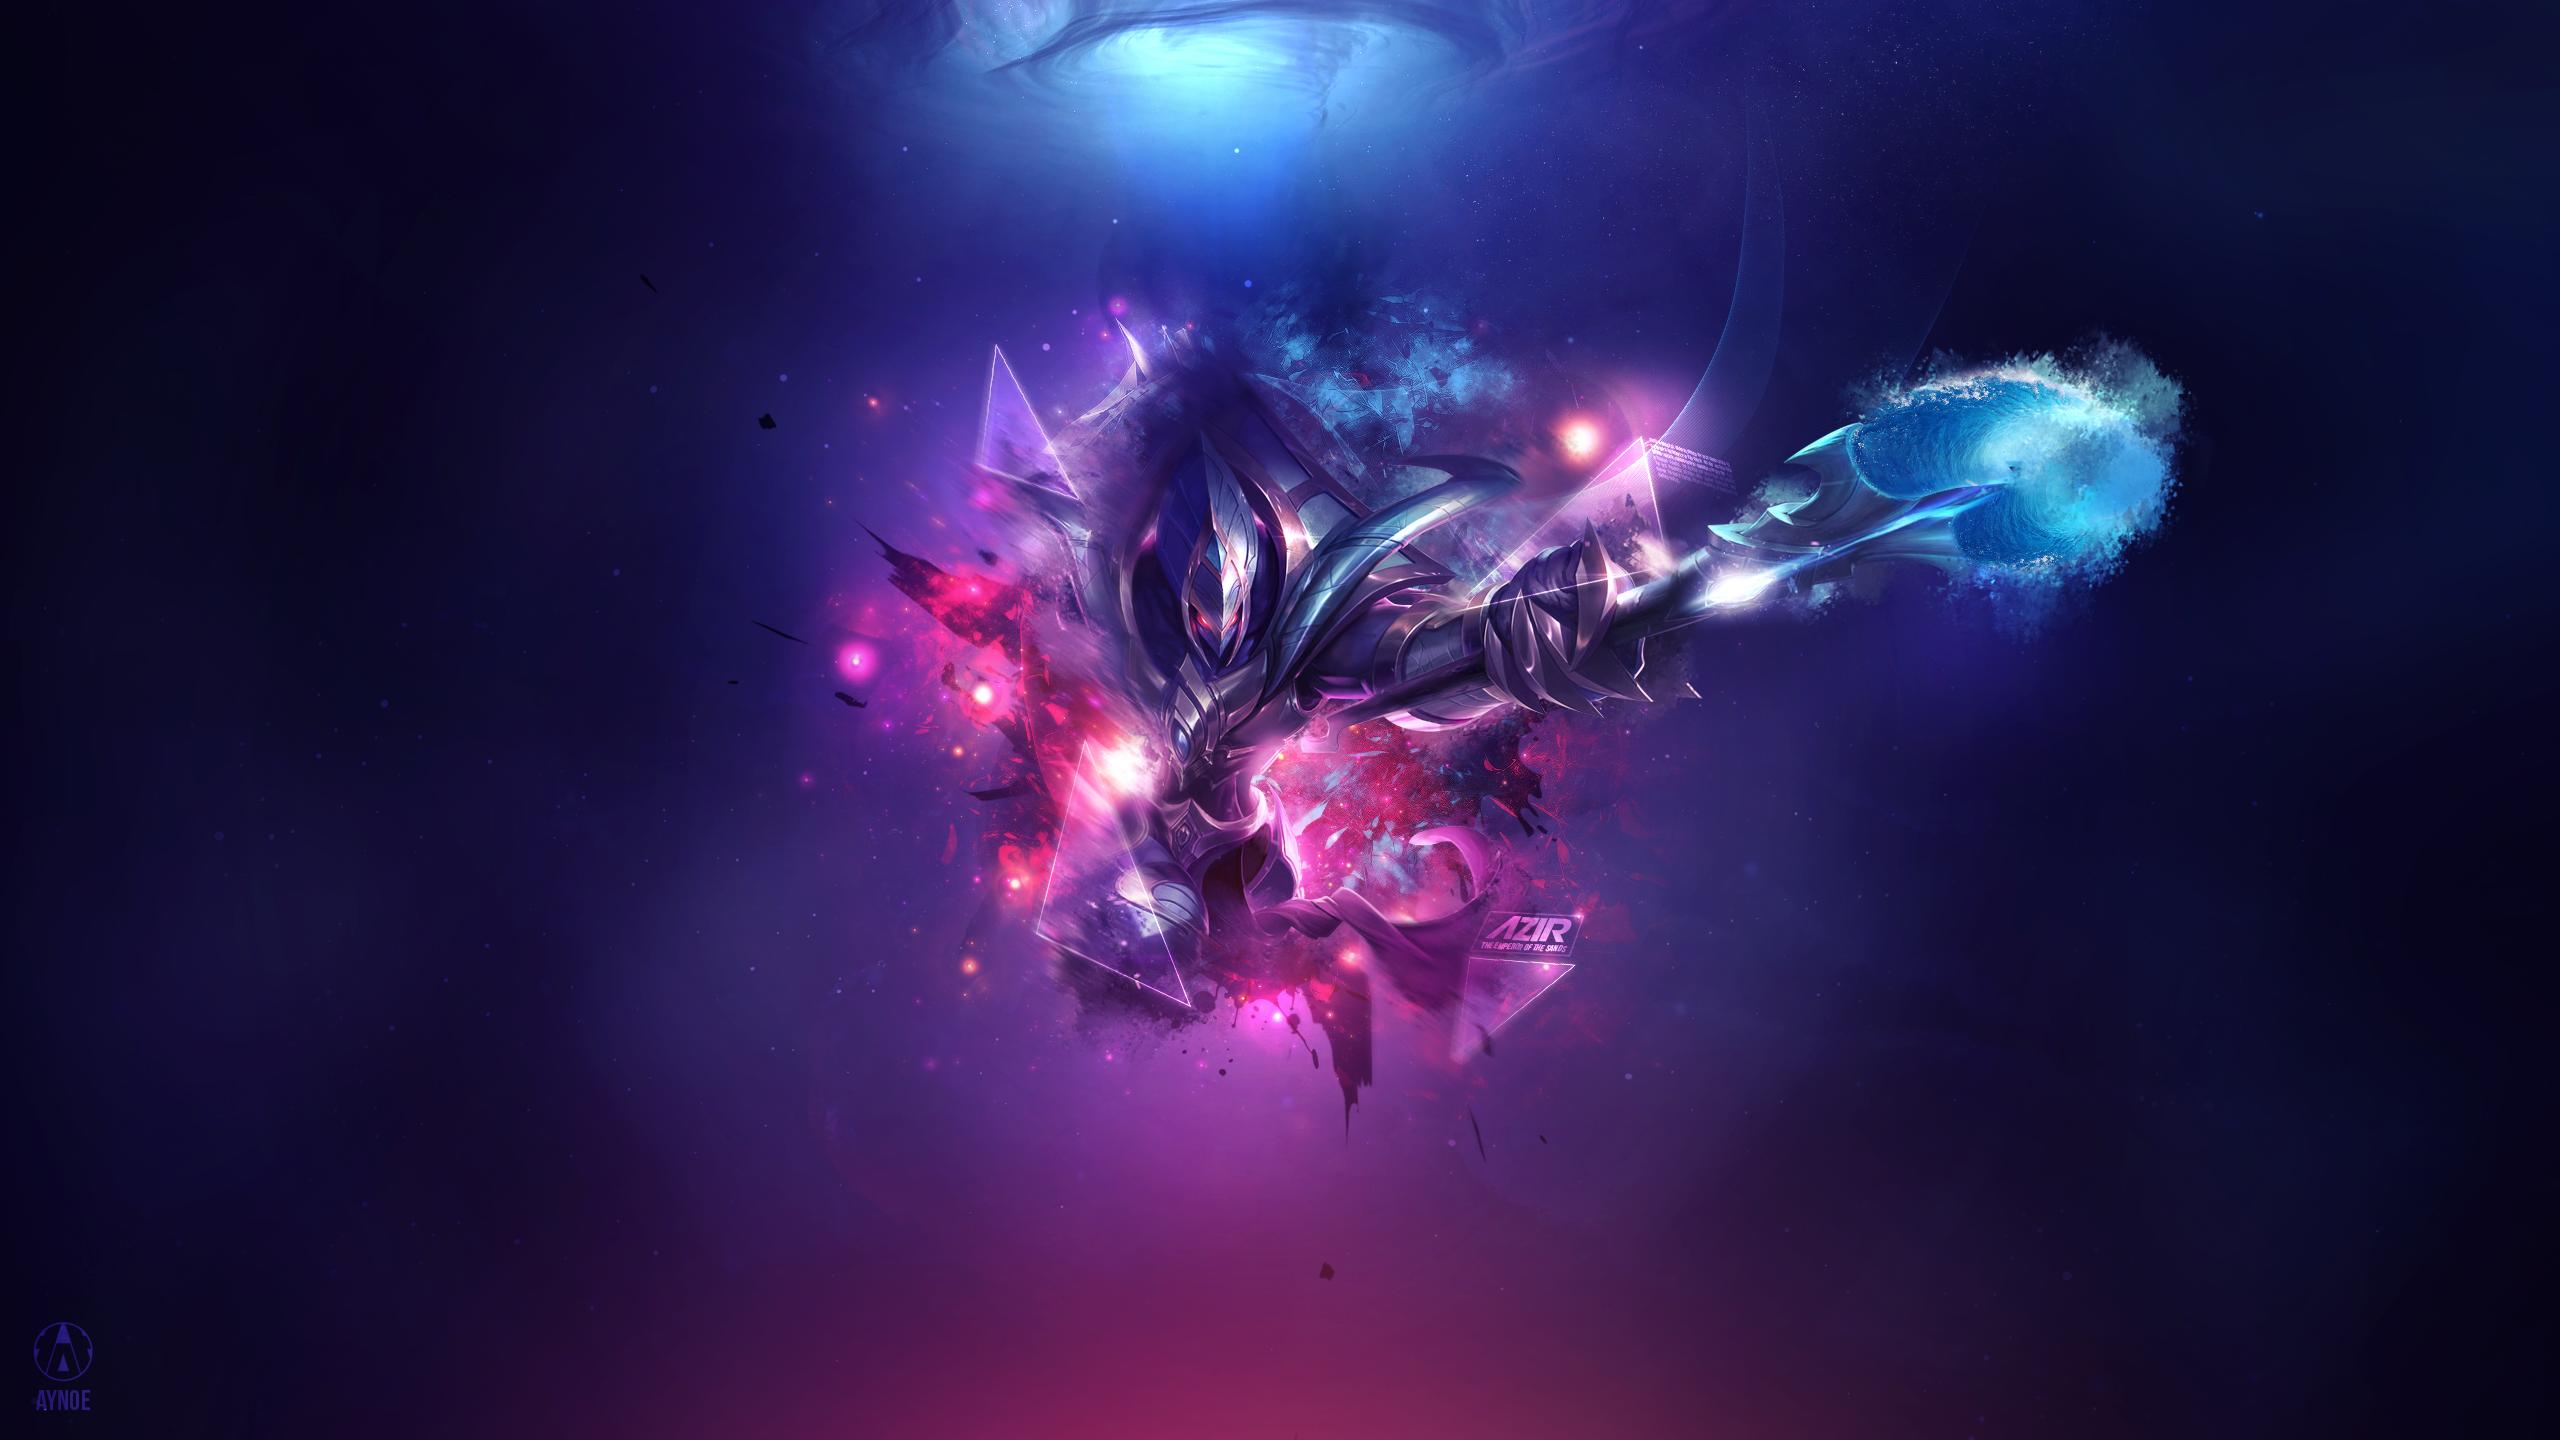 Galactic Azir League Of Legends Wallpaper By Aynoe On Deviantart